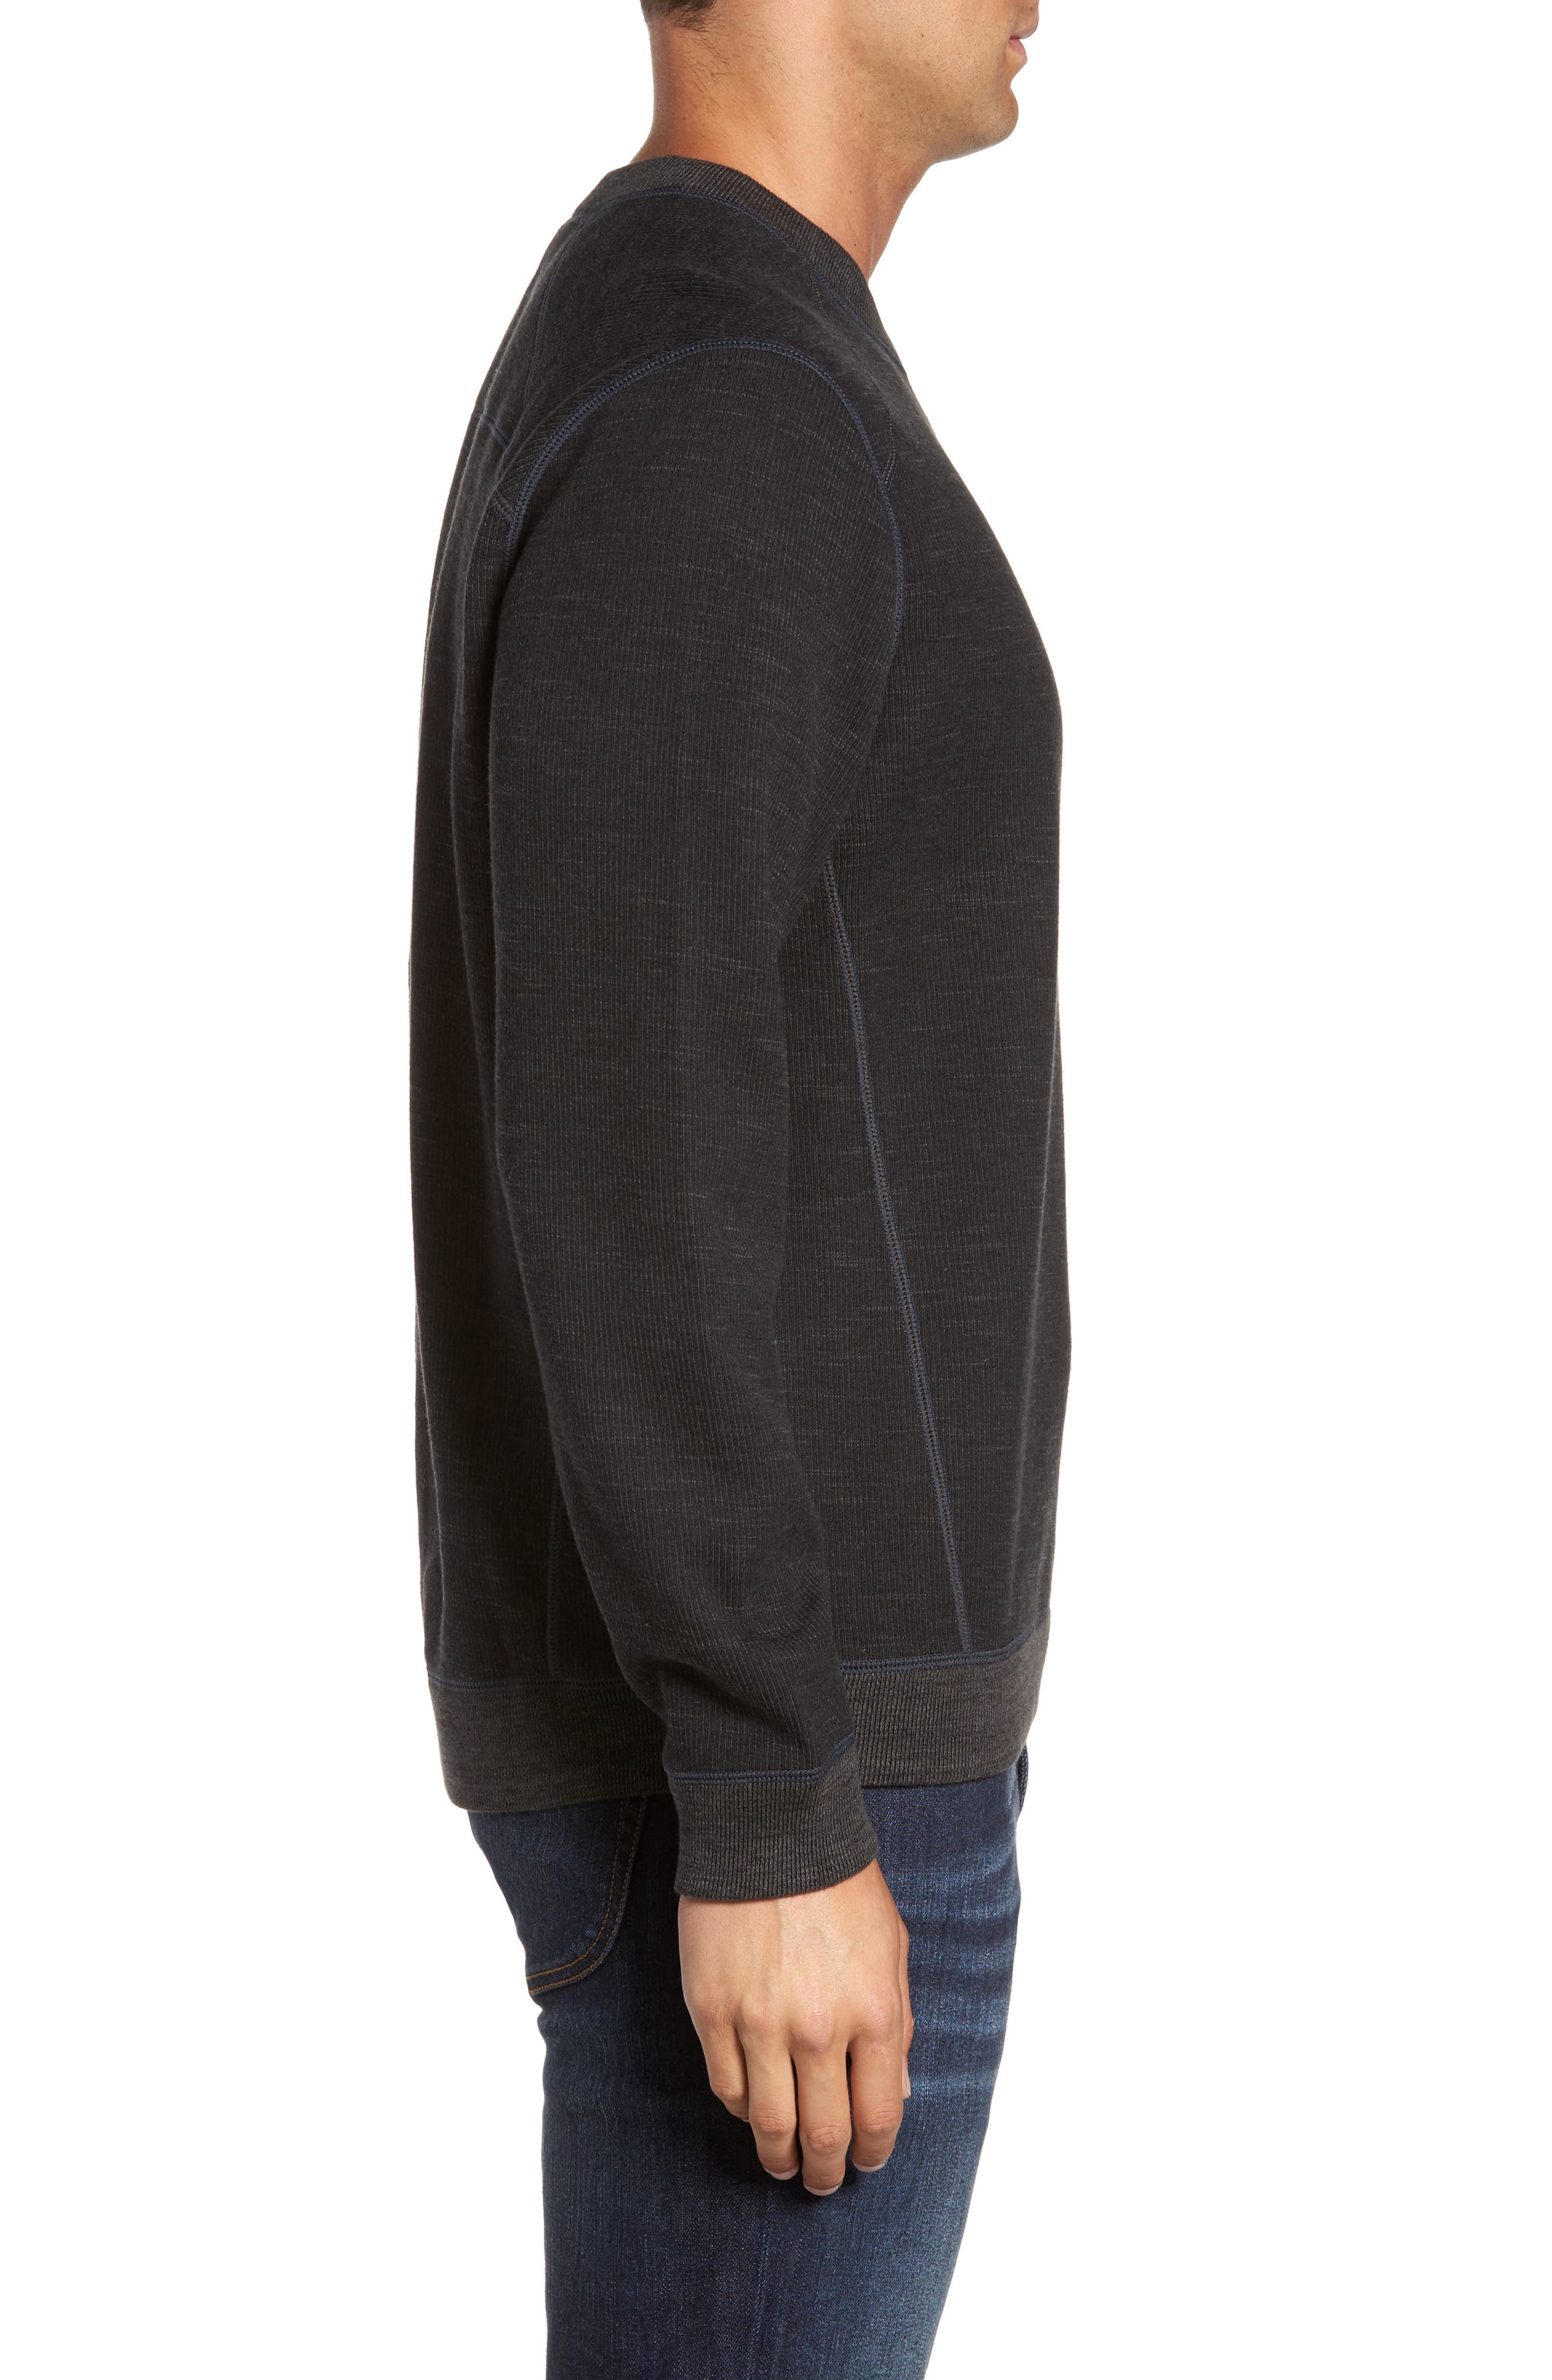 Flipside Pro Reversible Sweatshirt,                             Alternate thumbnail 3, color,                             001